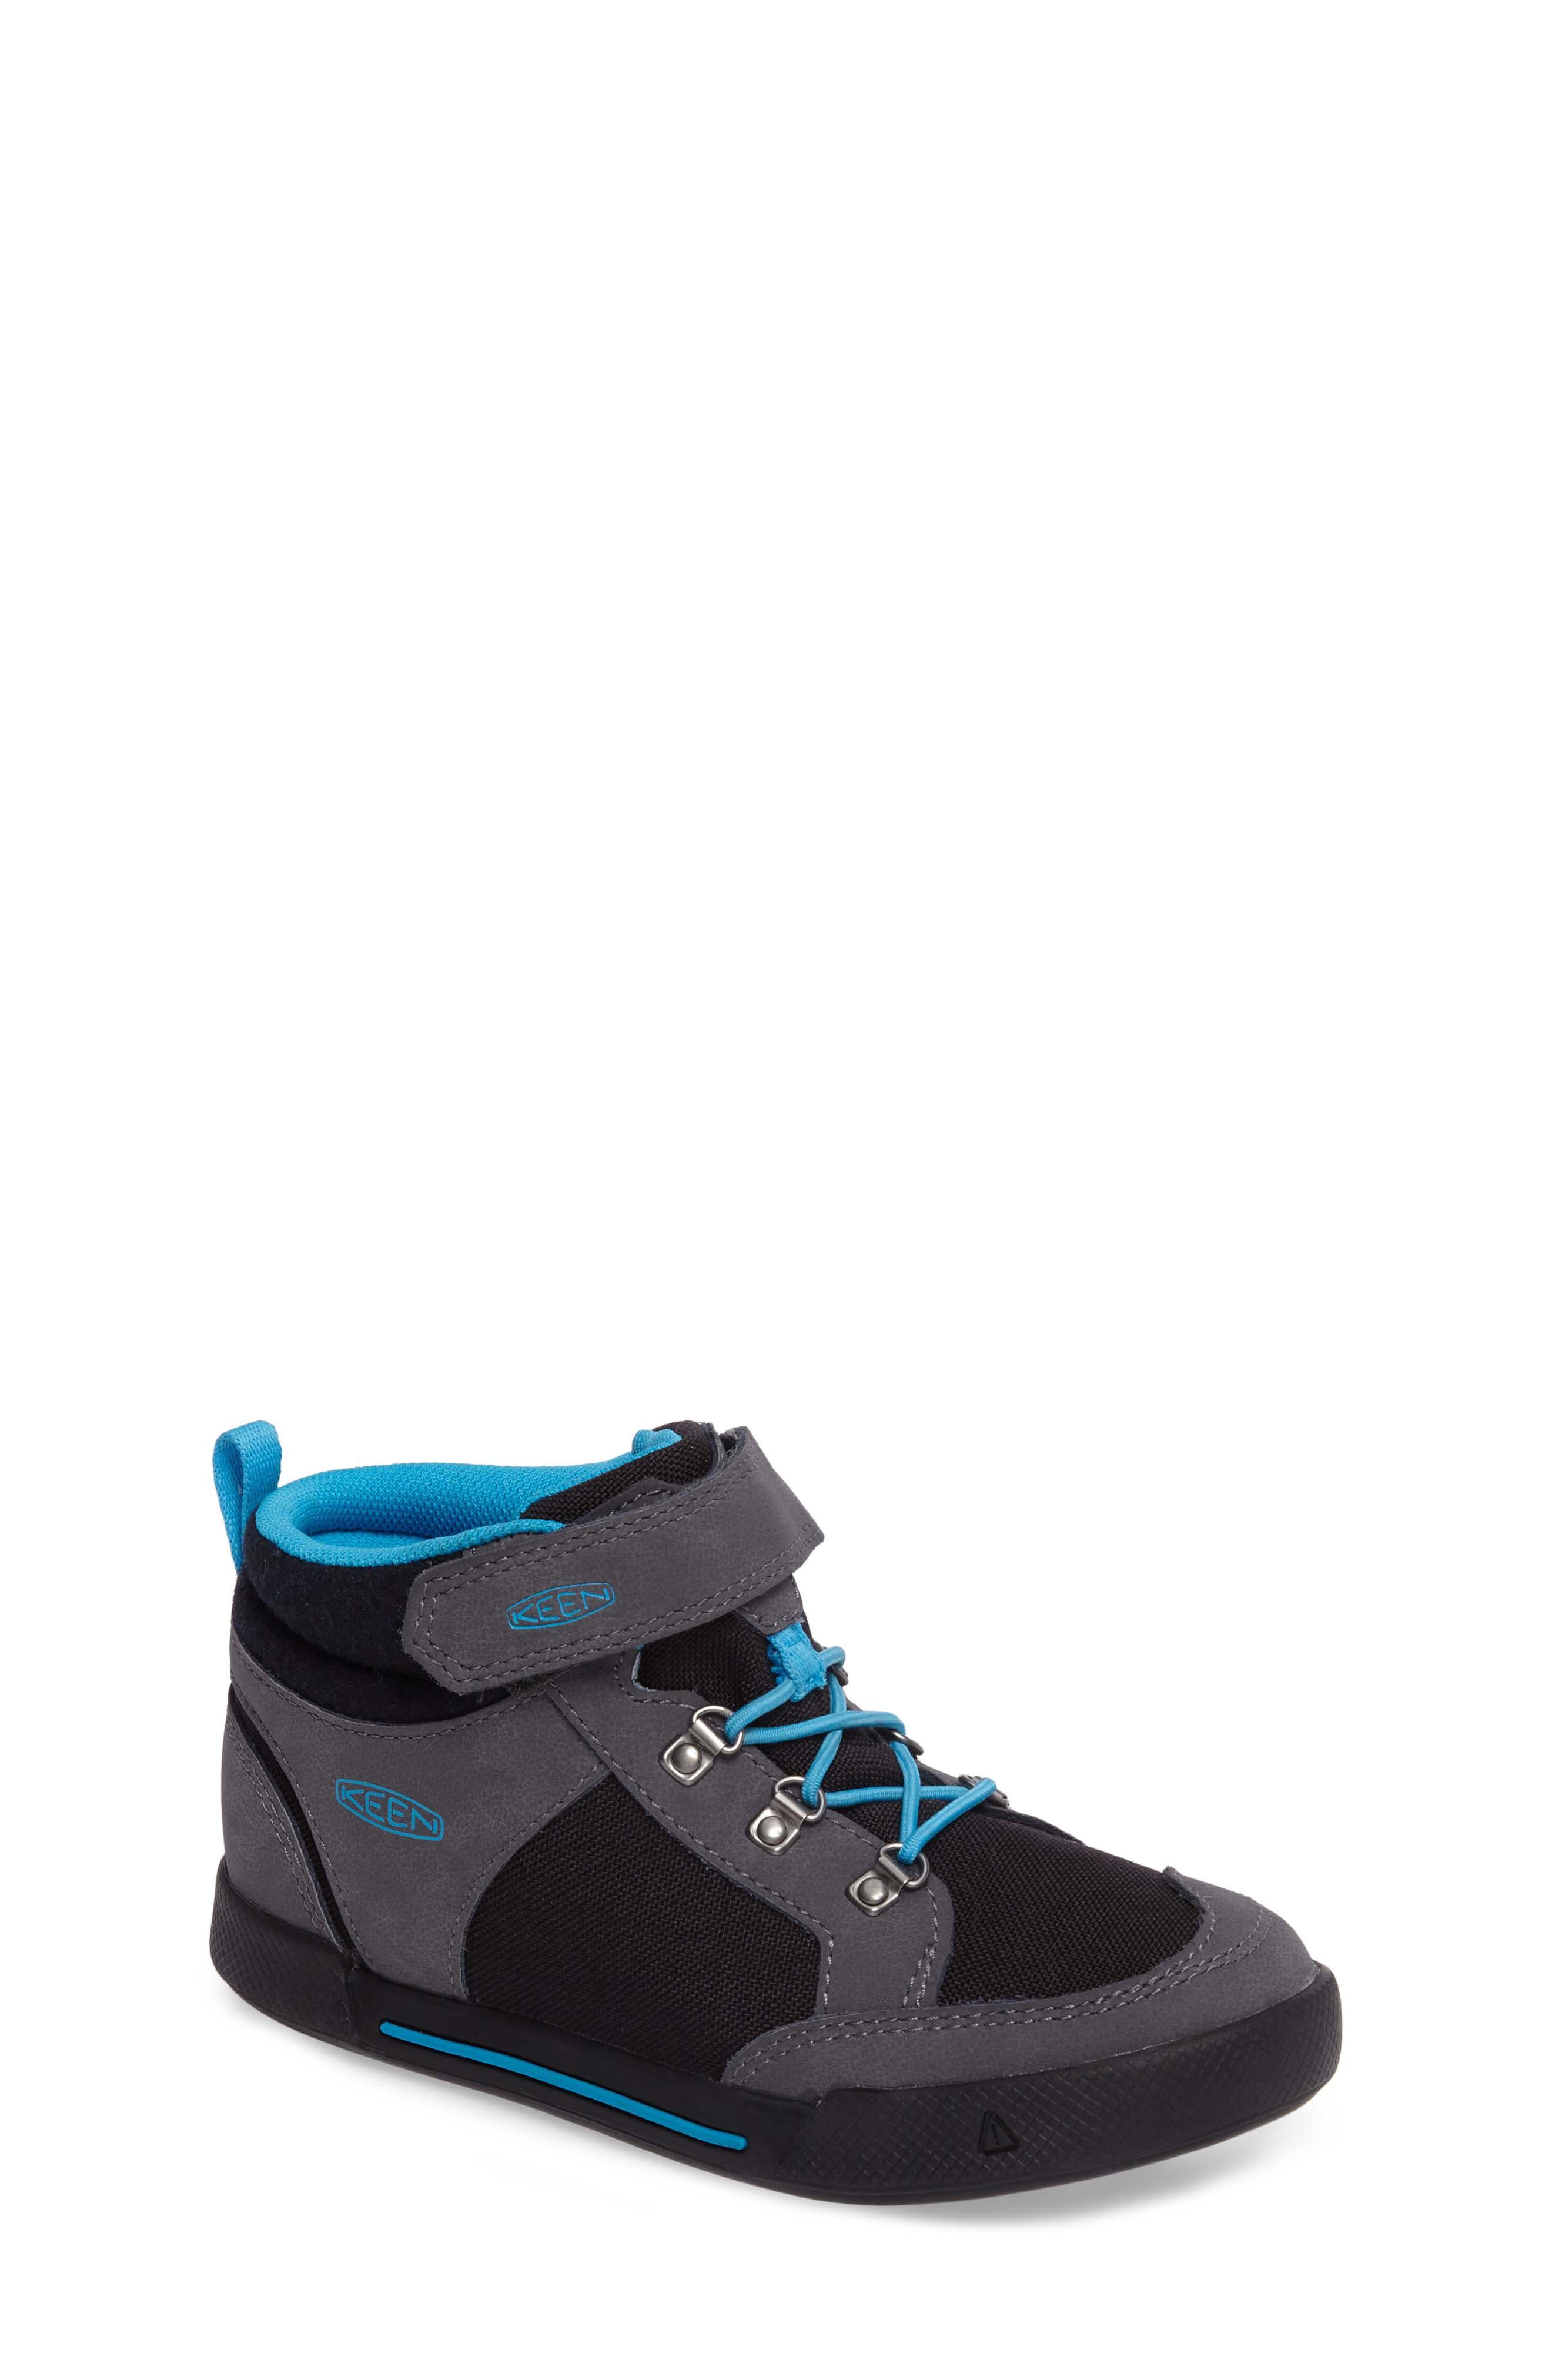 Main Image - Keen Encanto Wesley II High Top Sneaker (Toddler, Little Kid & Big Kid)